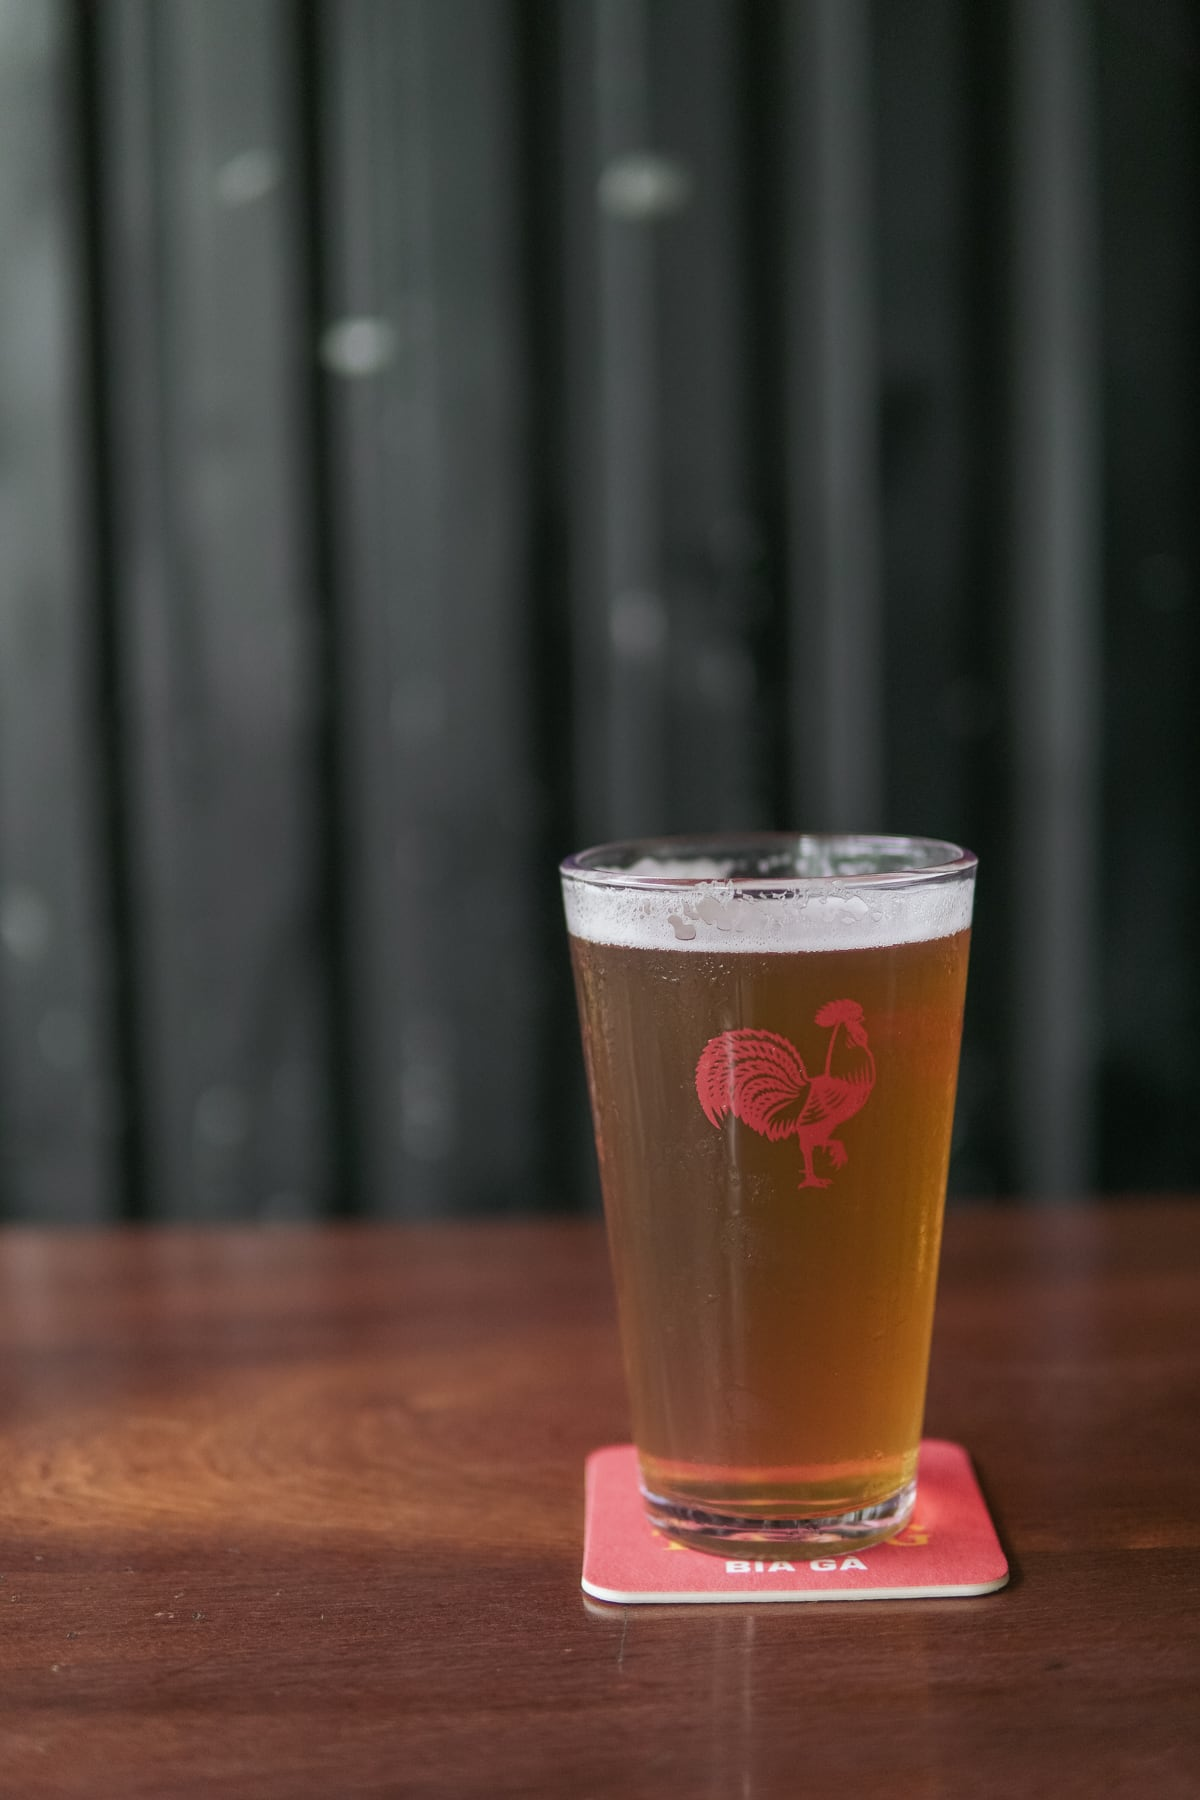 Rooster Beers Pilsner